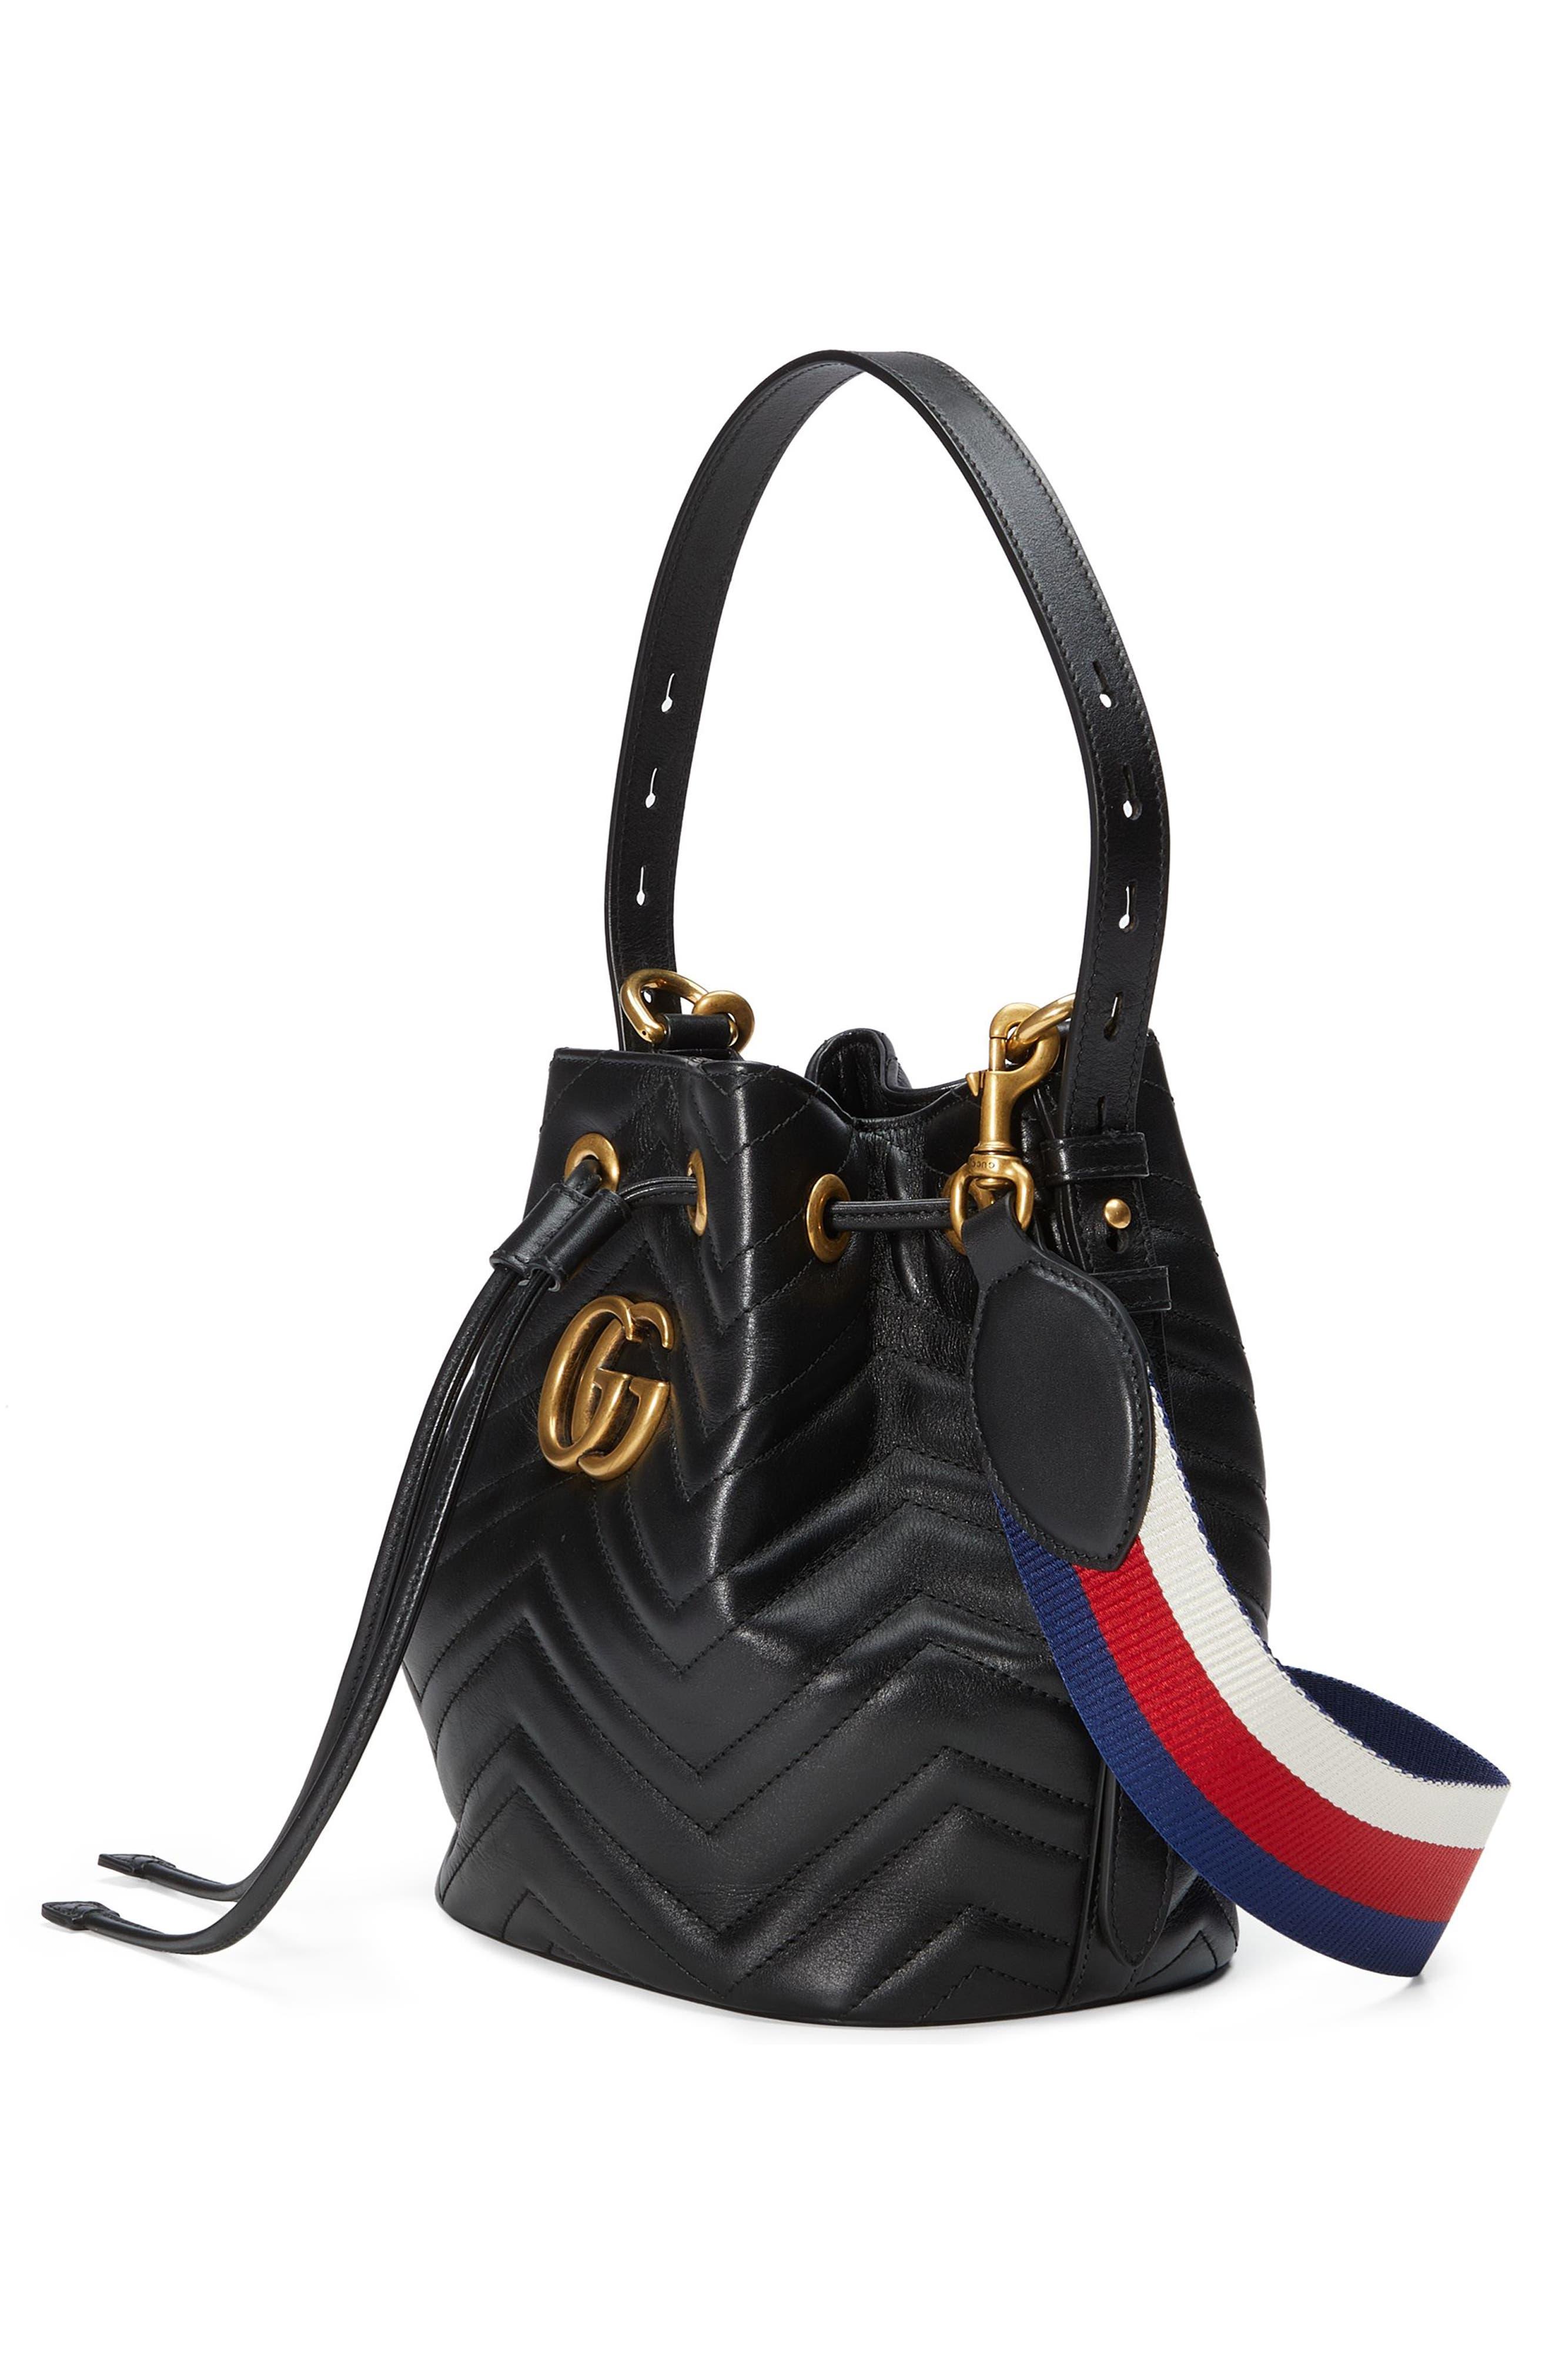 GG Marmont 2.0 Matelassé Leather Bucket Bag,                             Alternate thumbnail 4, color,                             Nero